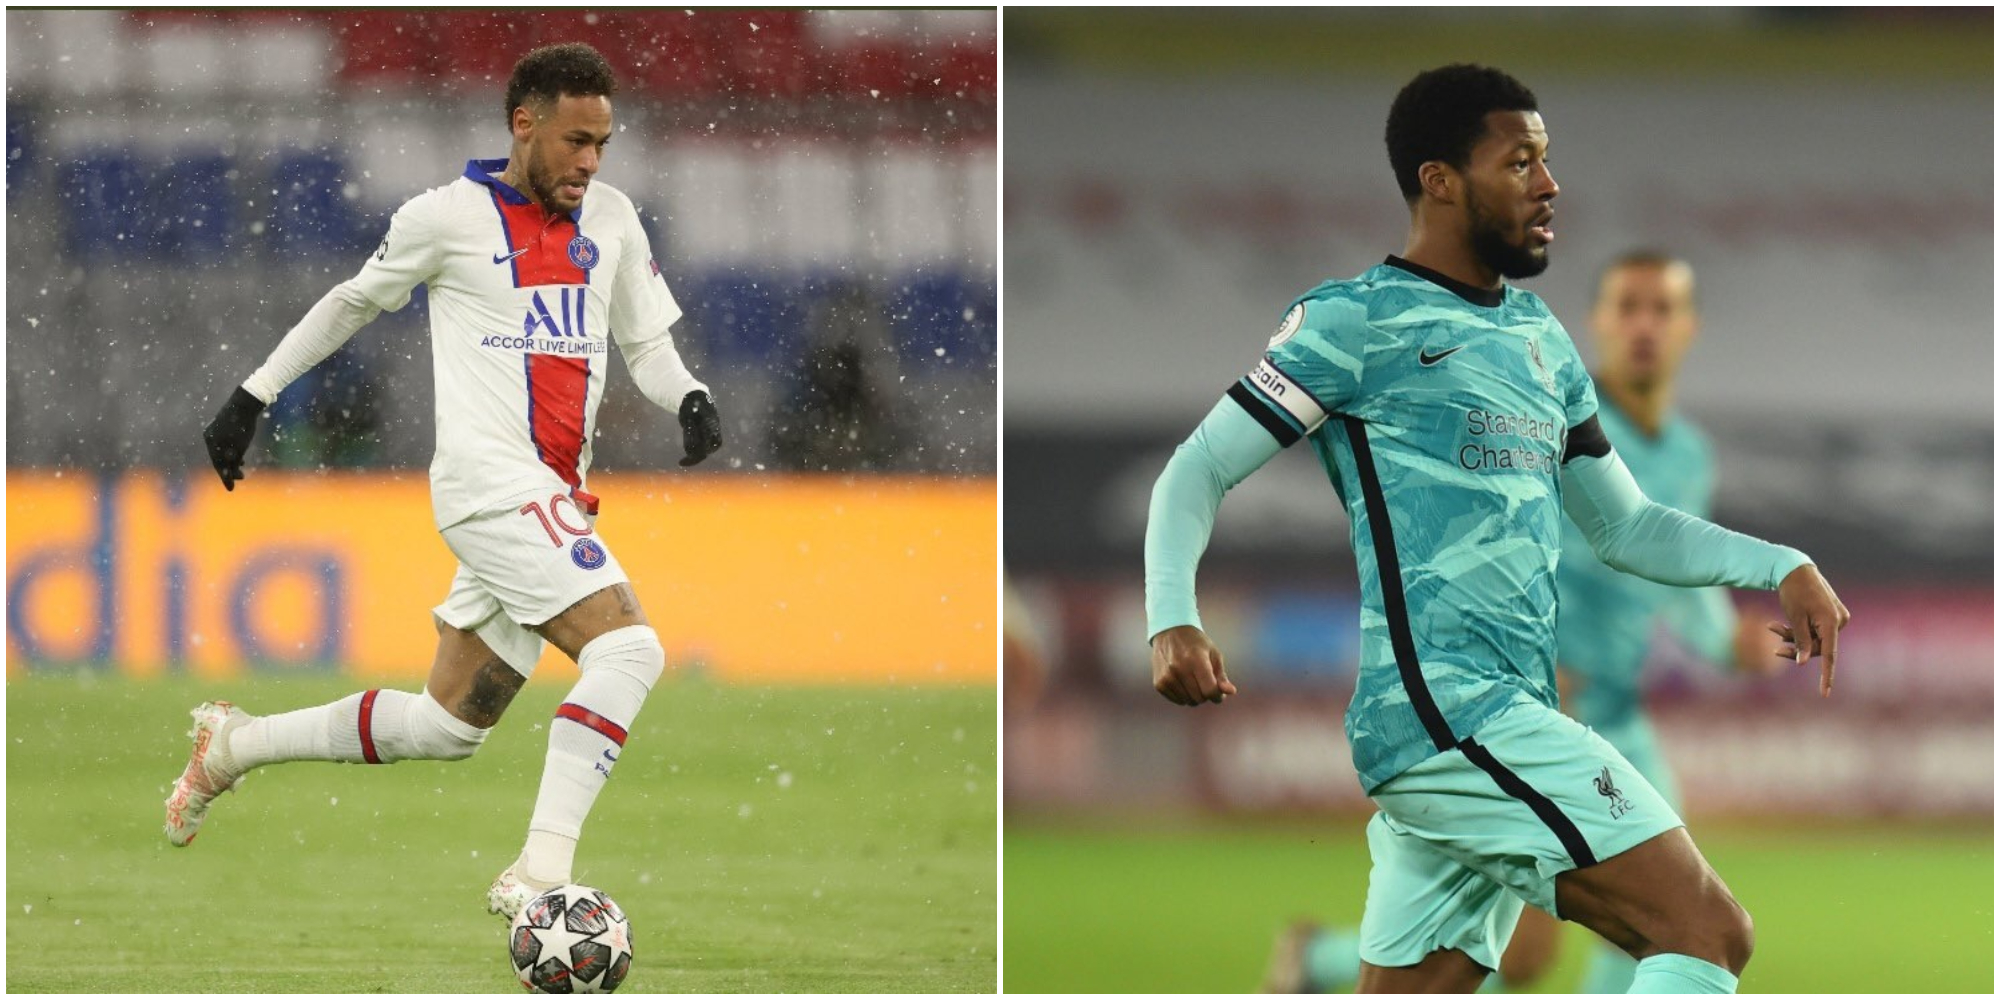 Report claims Barcelona players want €110m ex-star ahead of Wijnaldum – Mundo Deportivo